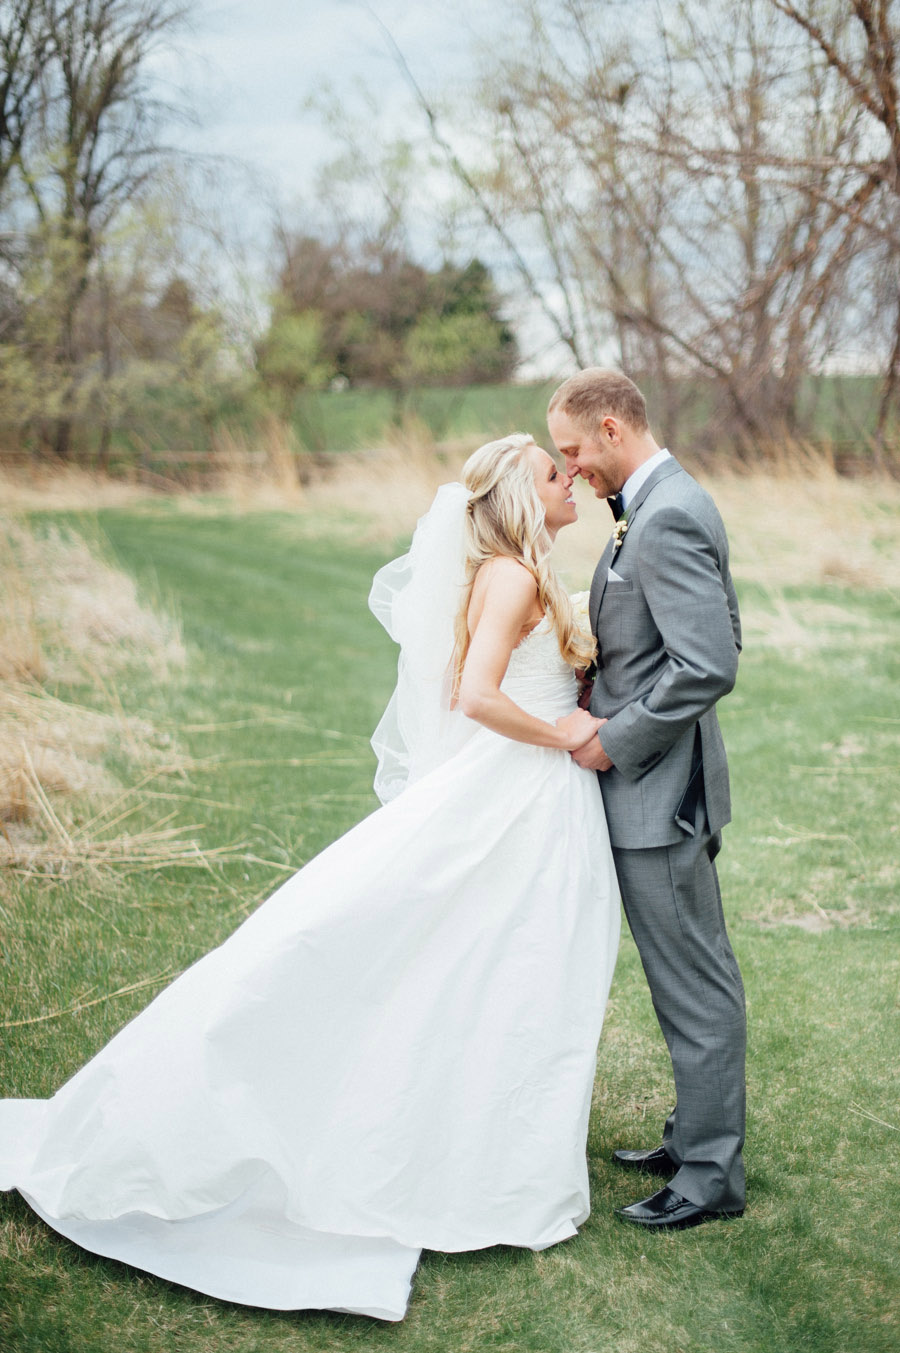 Liz-and-Lance-Wedding-19.jpg